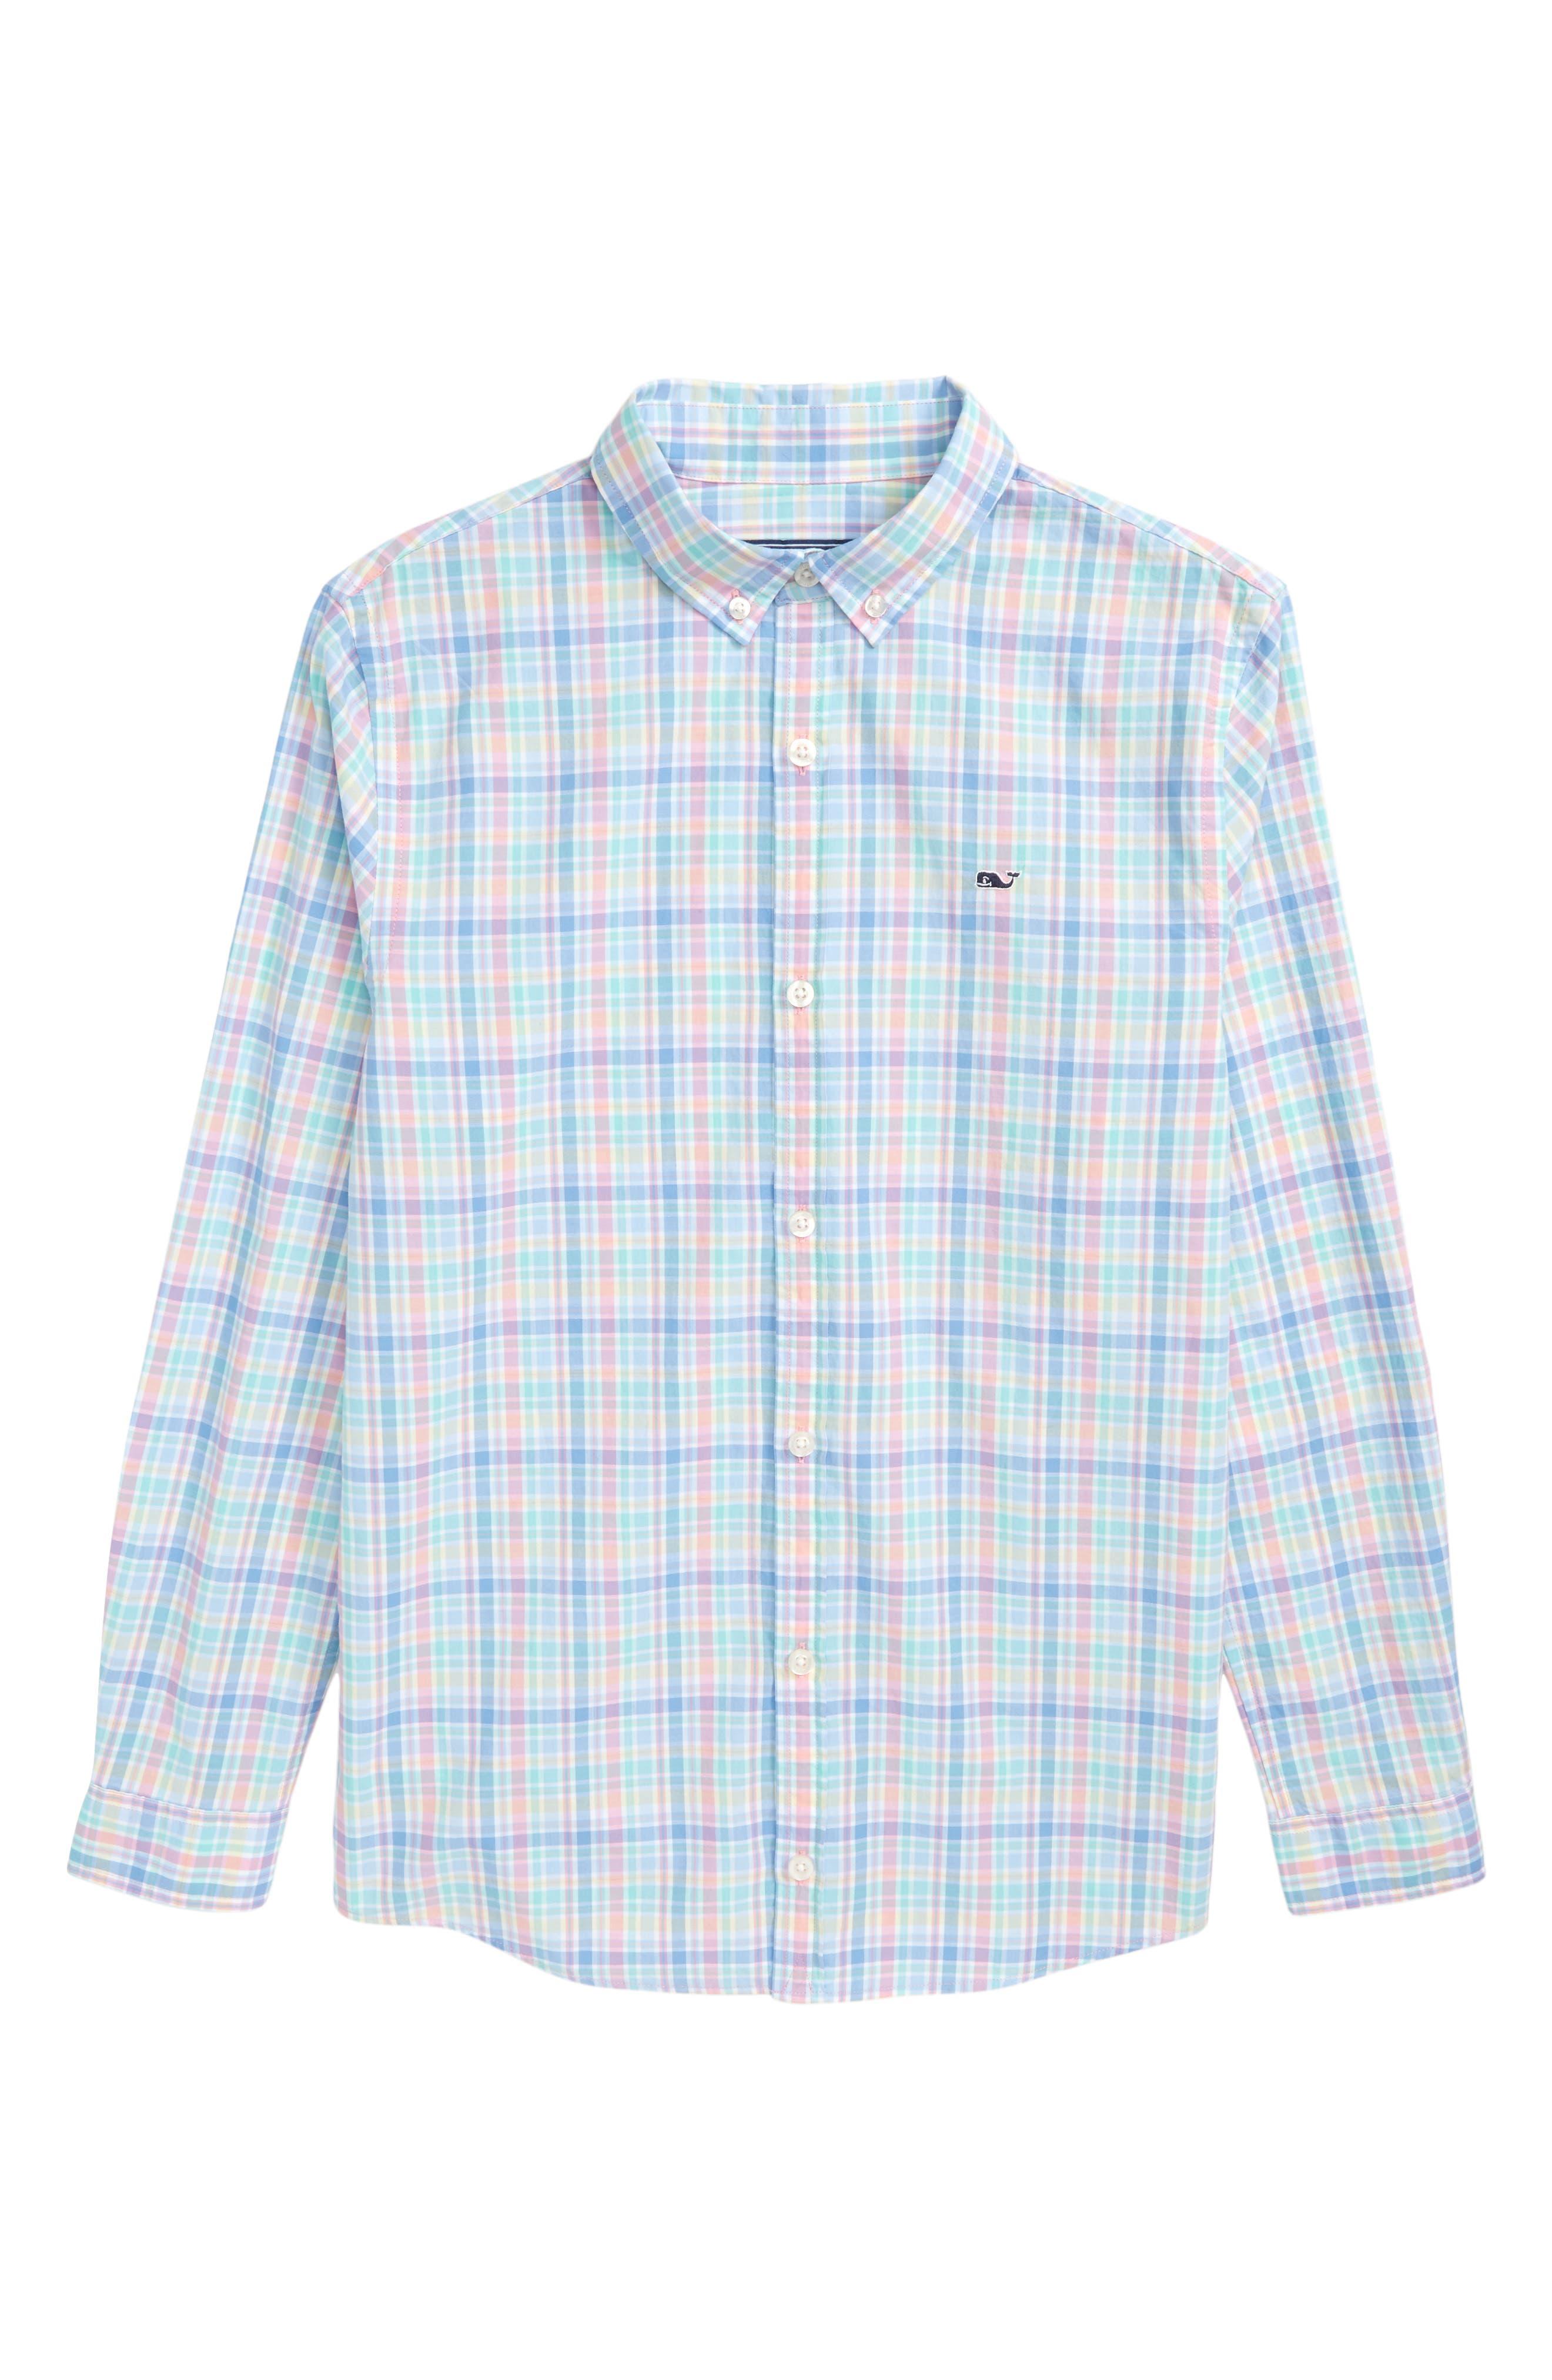 Walker's Cay Plaid Woven Shirt,                         Main,                         color, Jake Blue